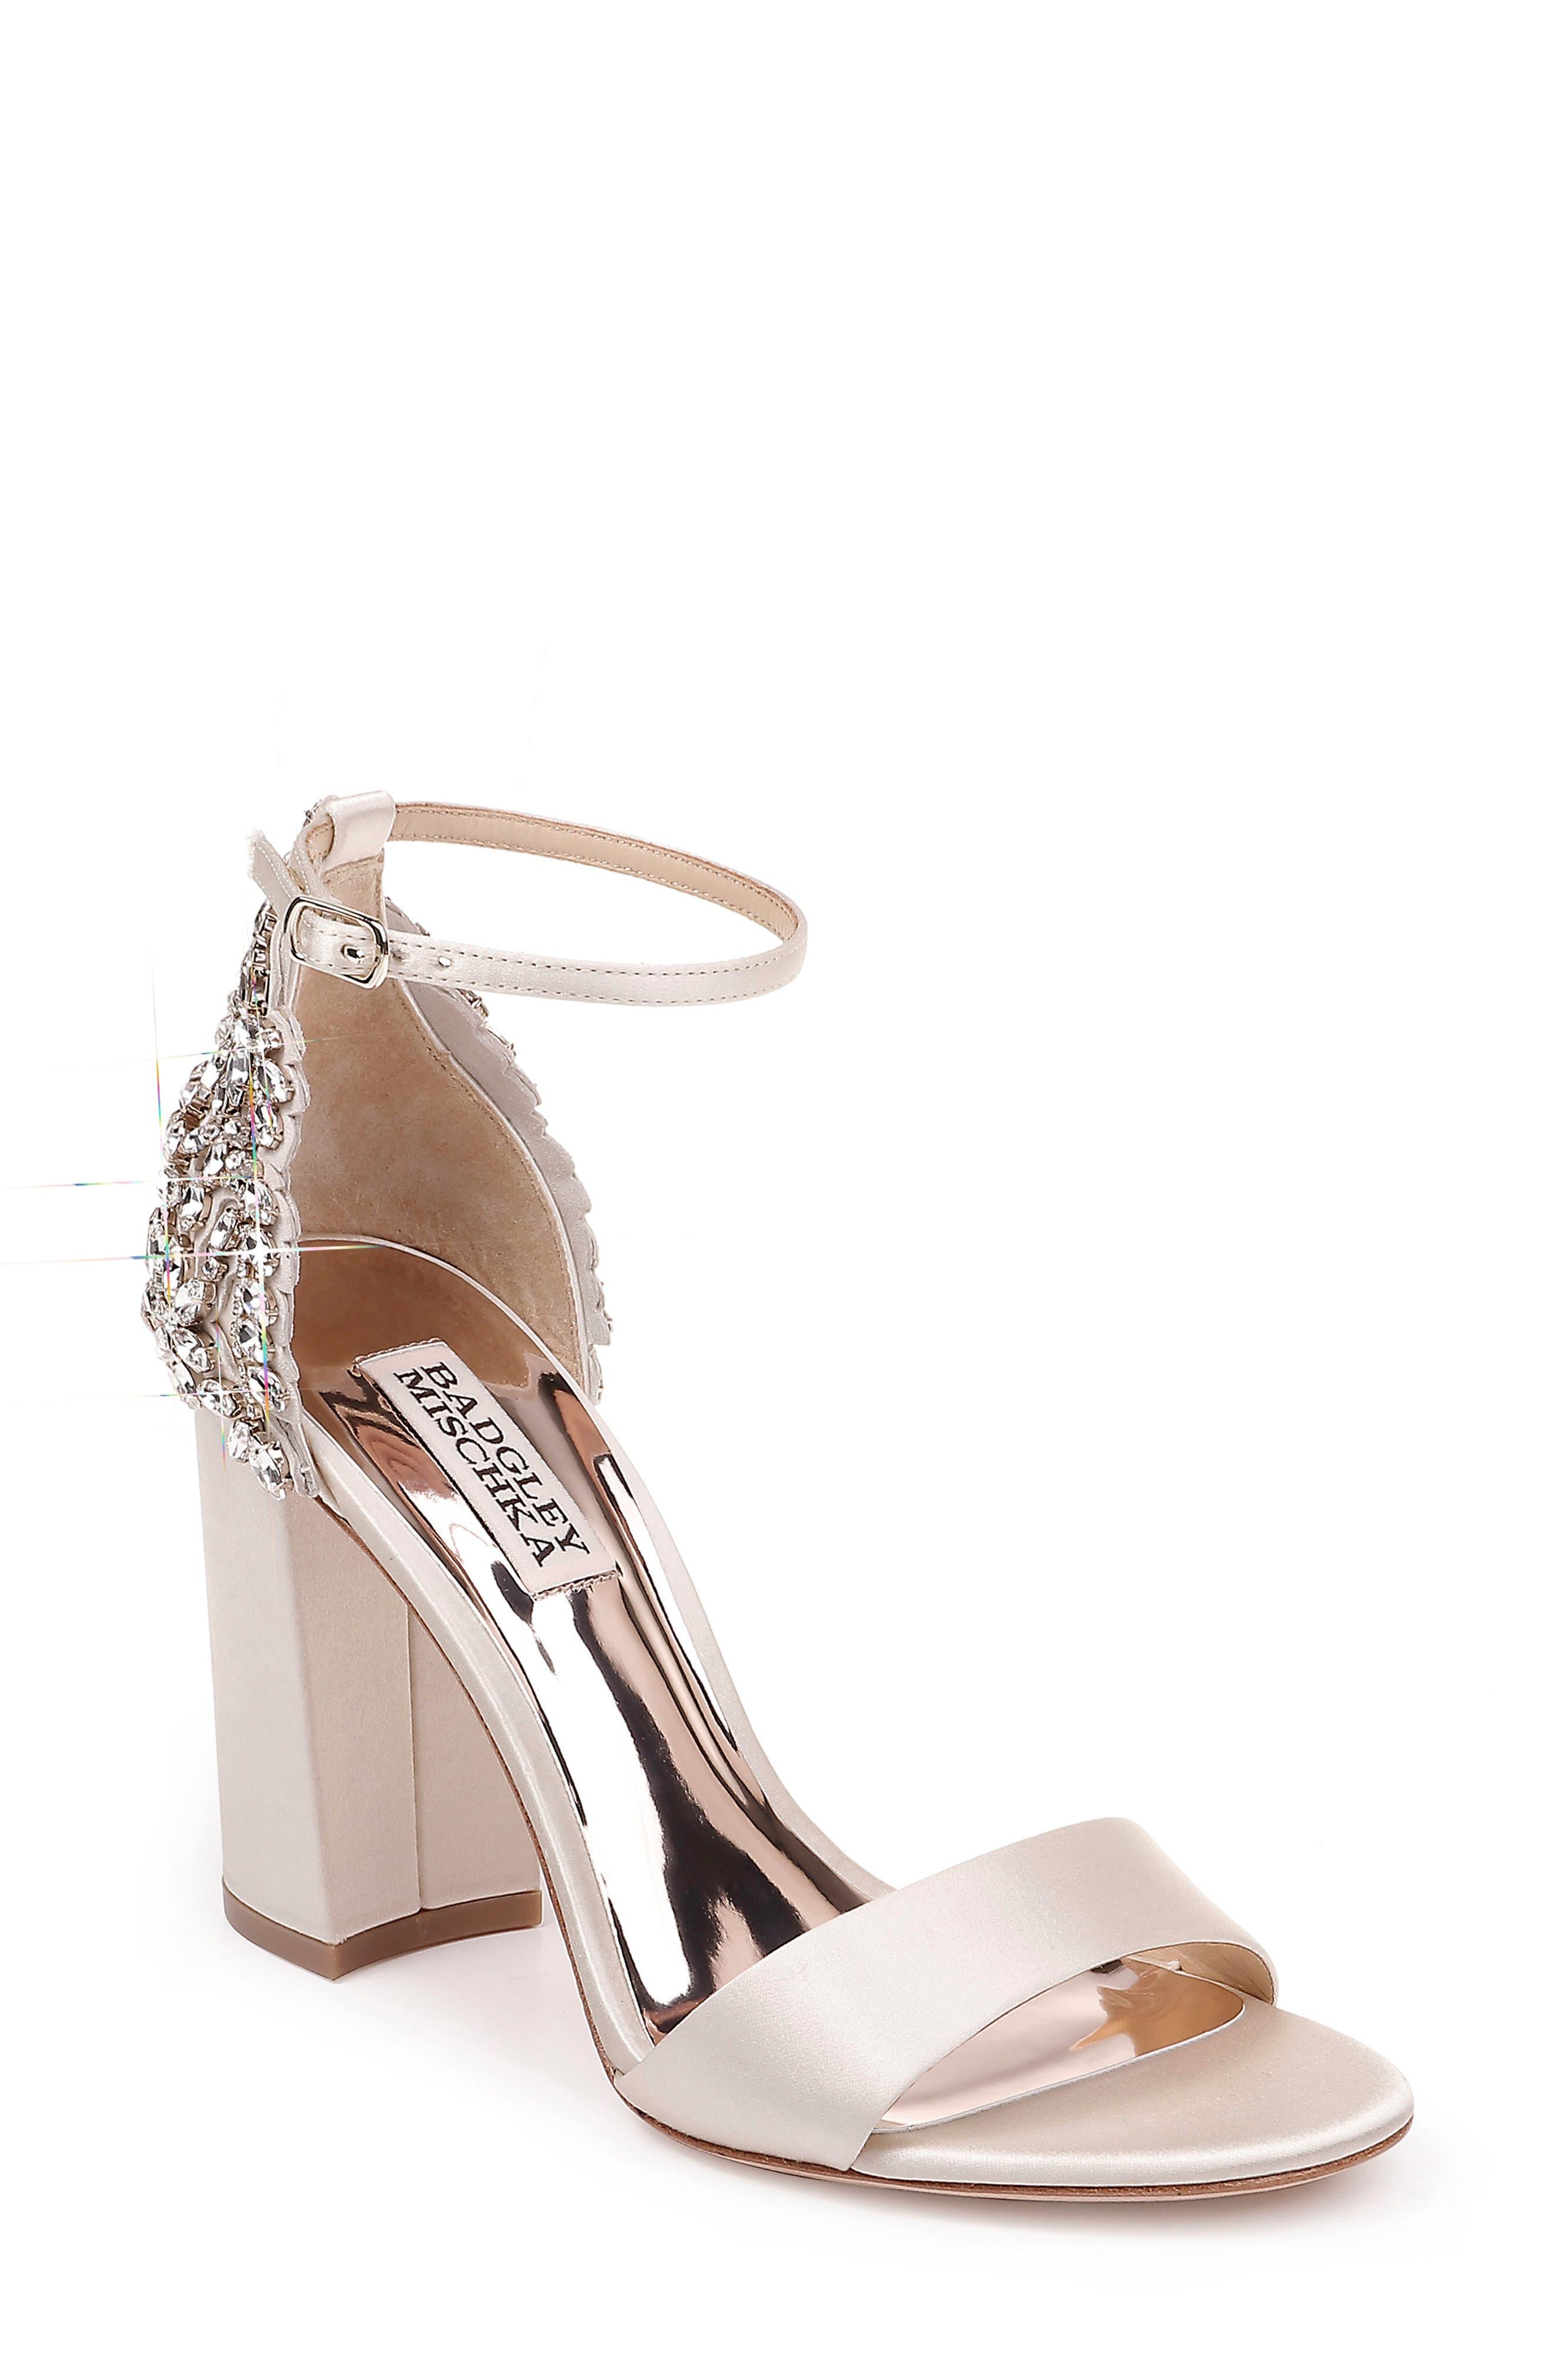 Badgley Mischka Ainsley Crystal Embellished Ankle Strap Sandal (Women)